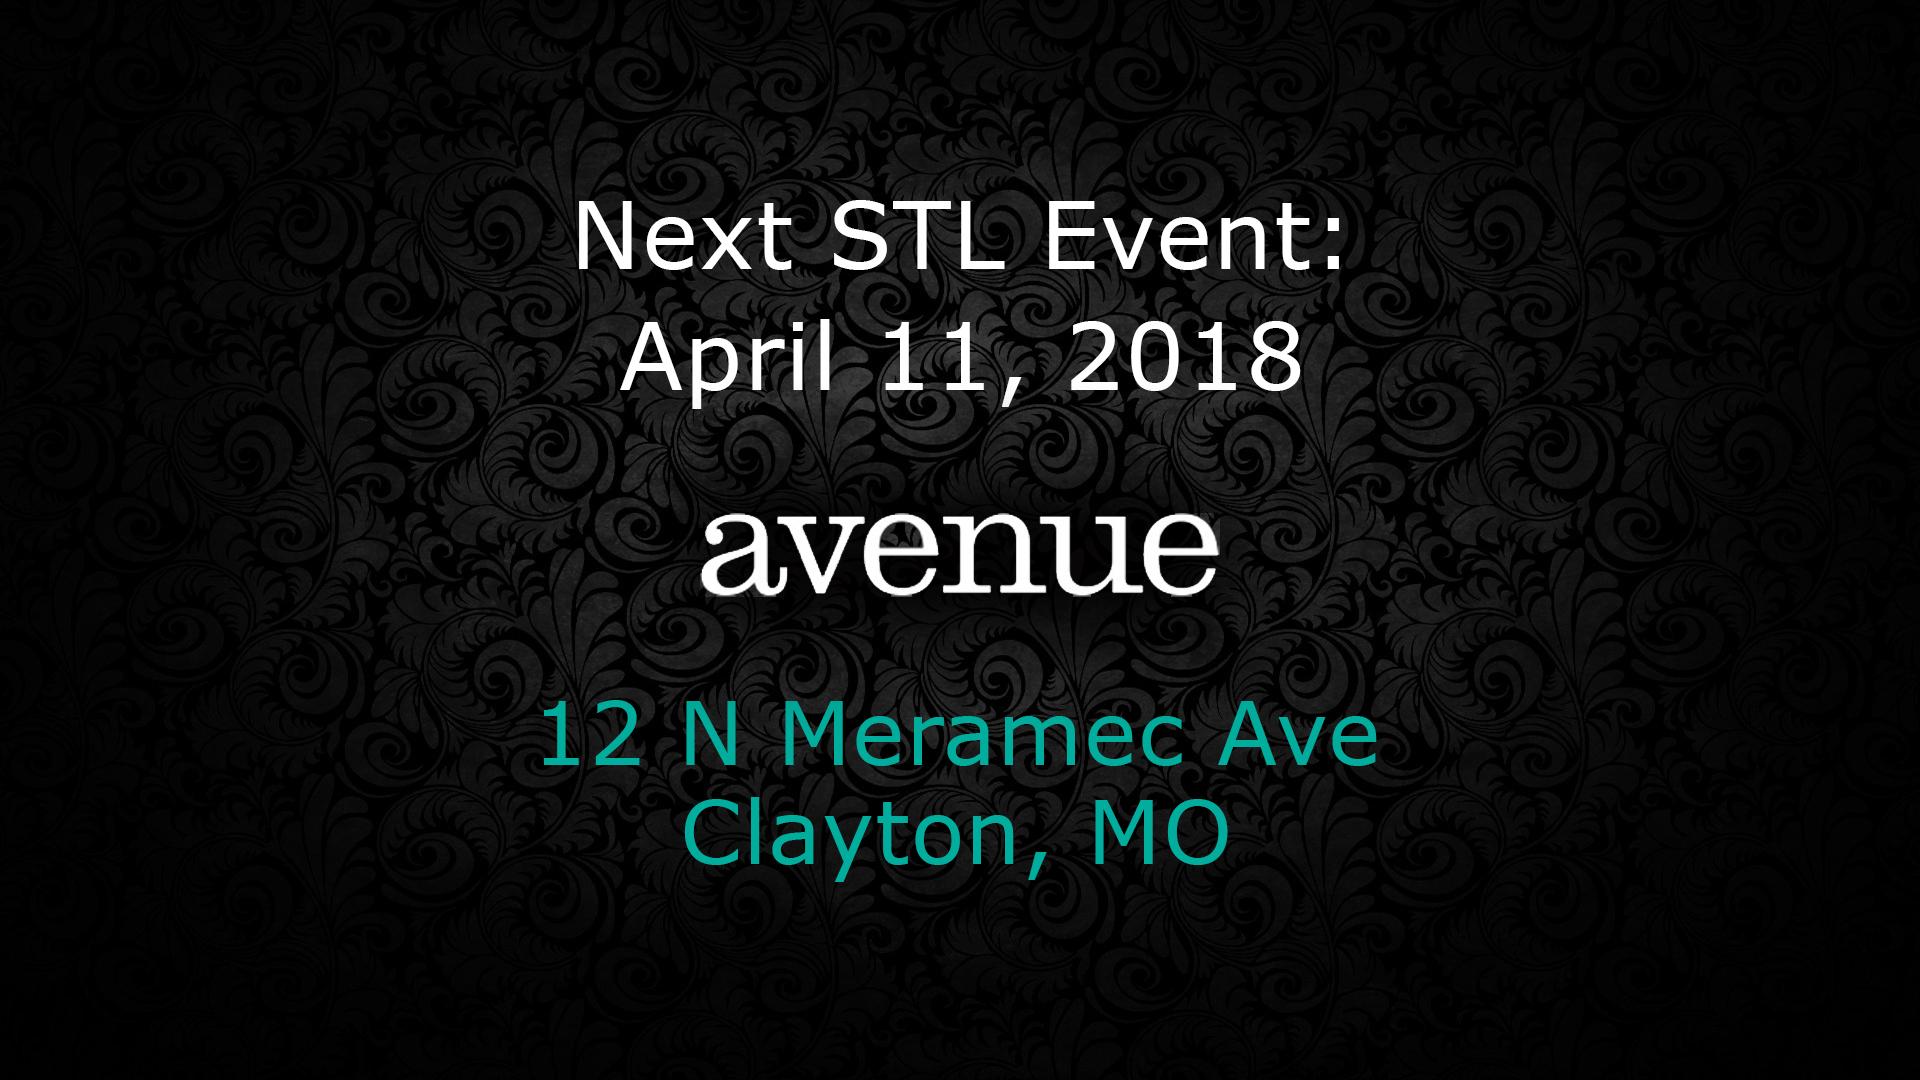 Avenue Event